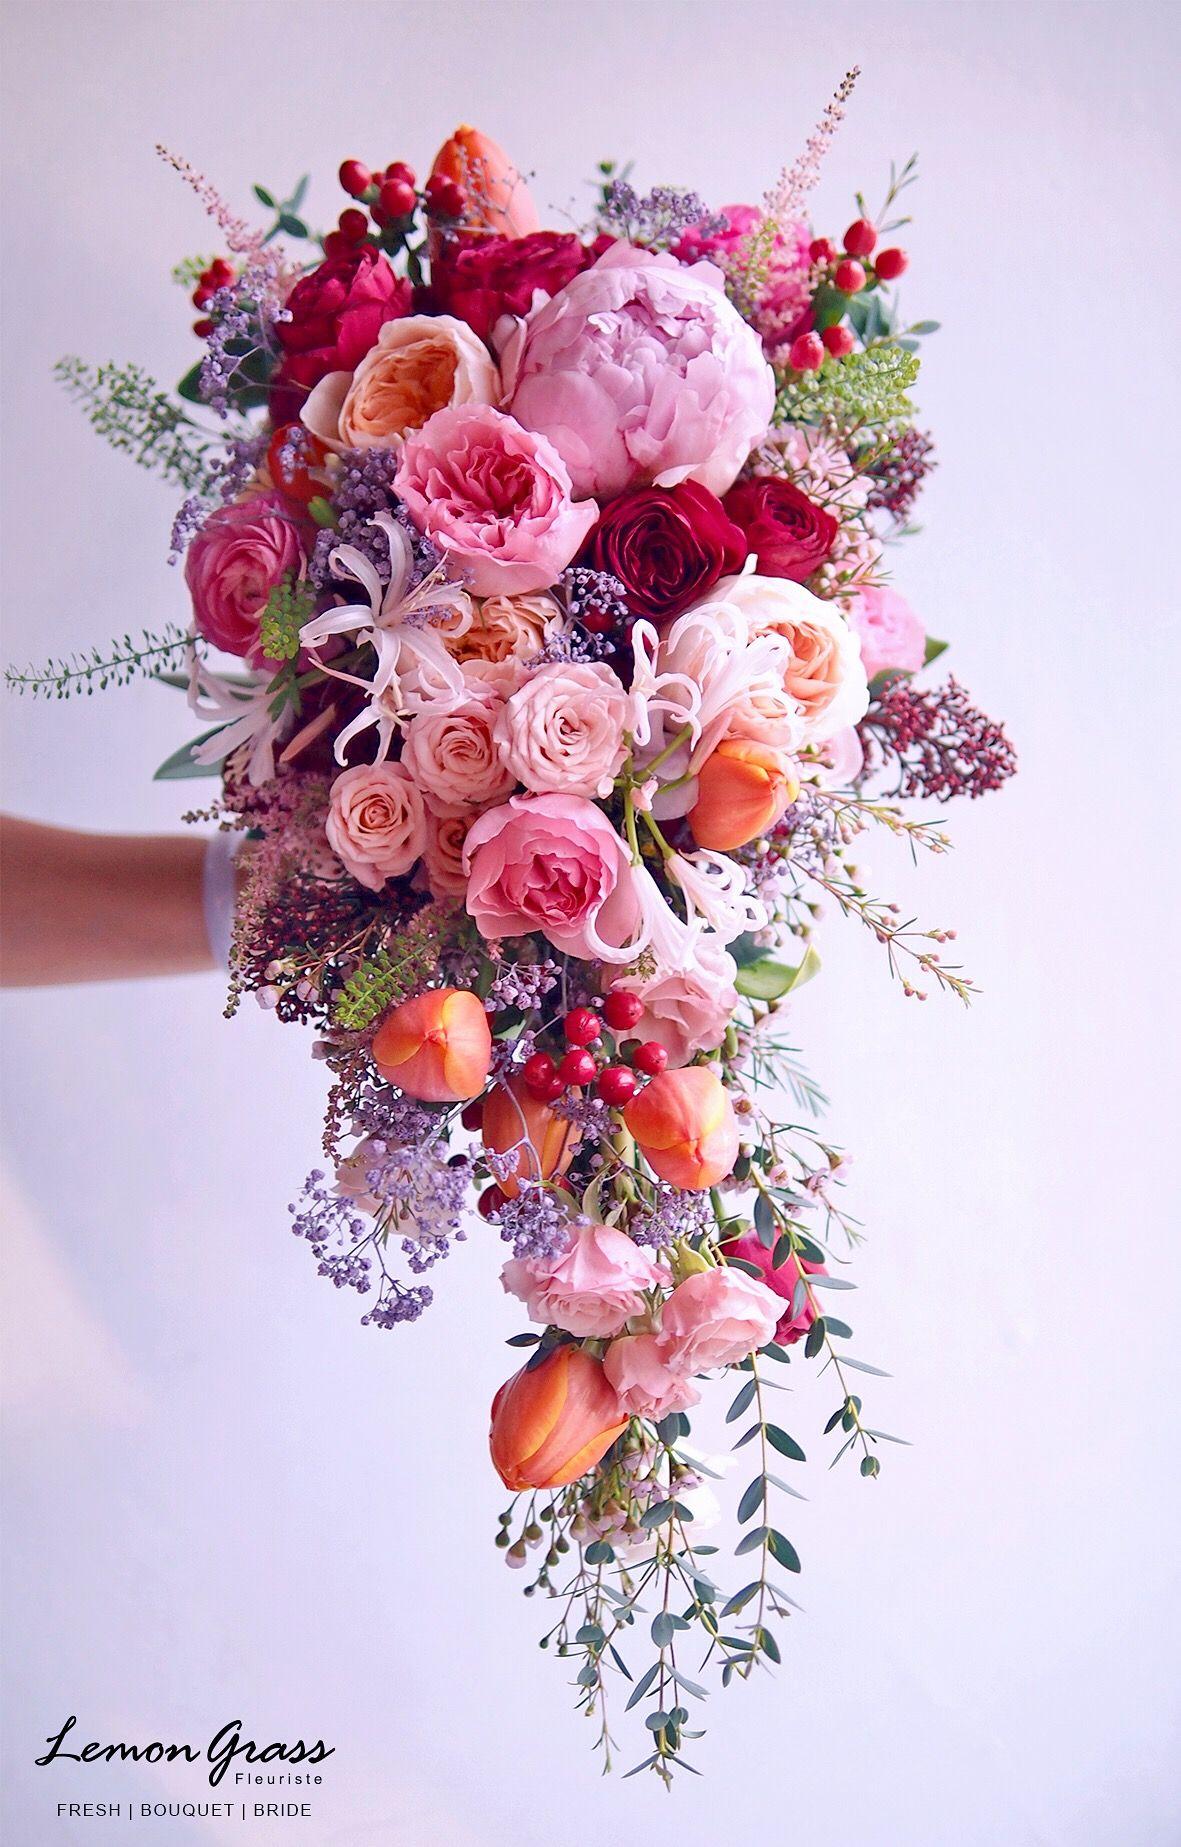 Pin by annabelle lefebvre on mariage pinterest flowers flower flower bouquets izmirmasajfo